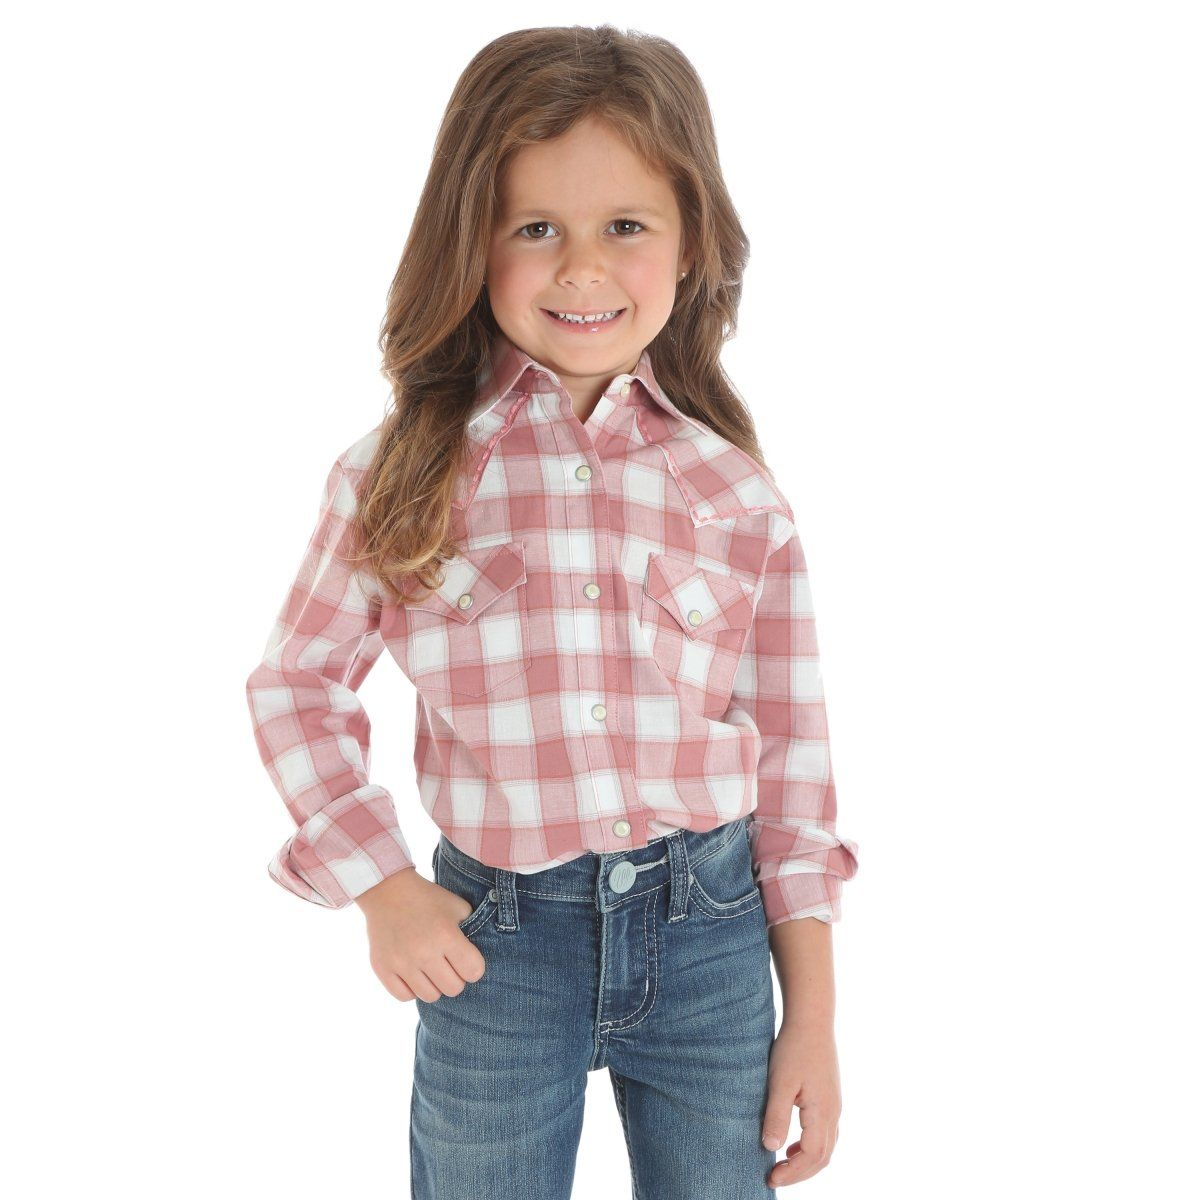 5e74c595 Wrangler Girl's Red & White Plaid Snap Up Western Shirt GW7213M ...